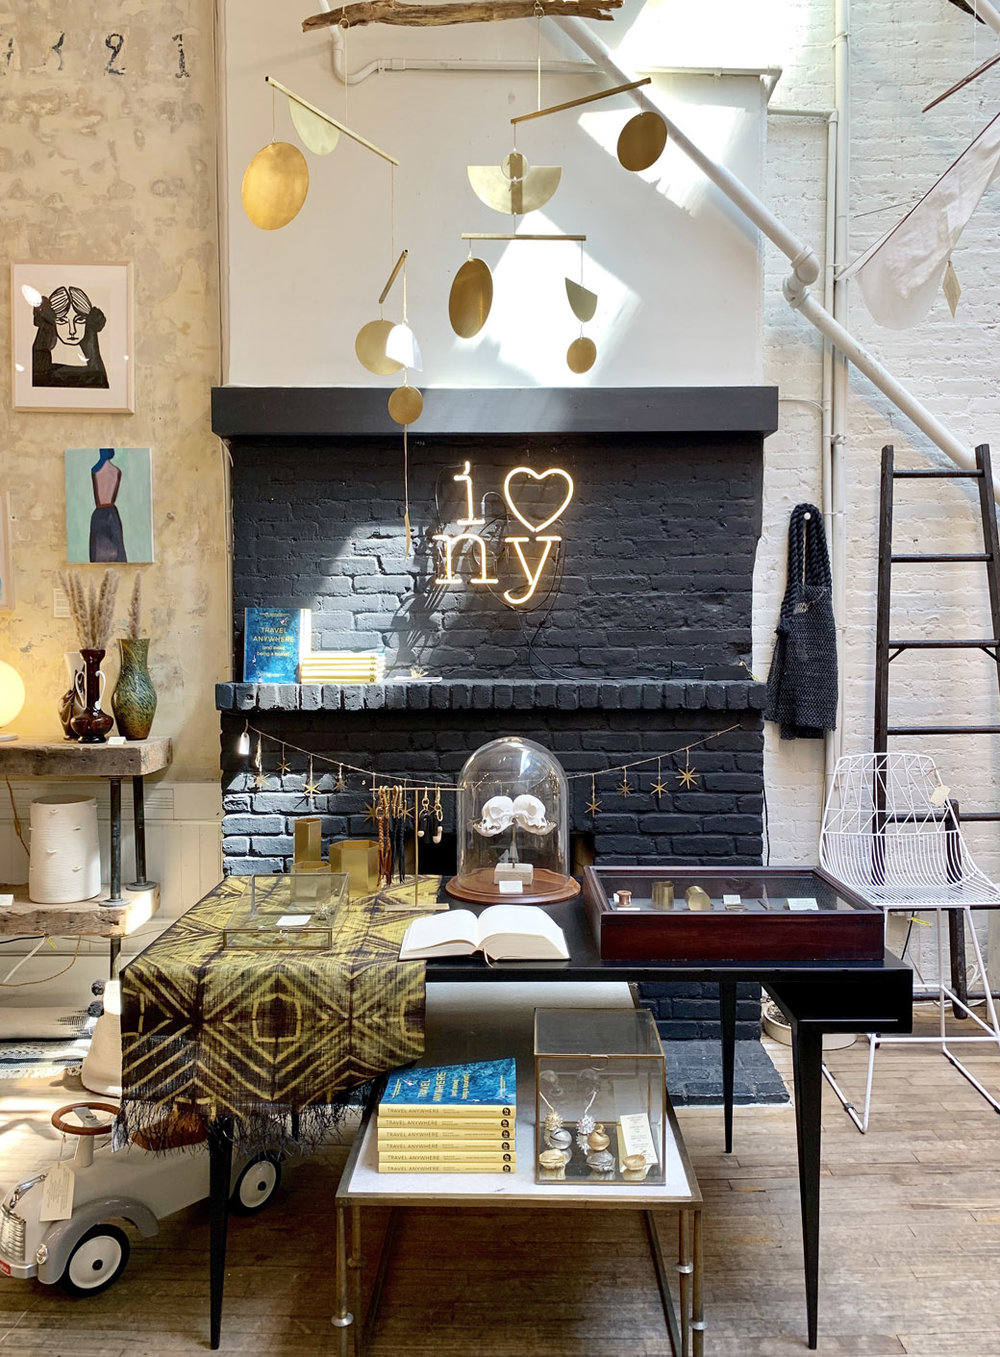 Visit New York City's Interior Design Haven: Michele Varian Shop